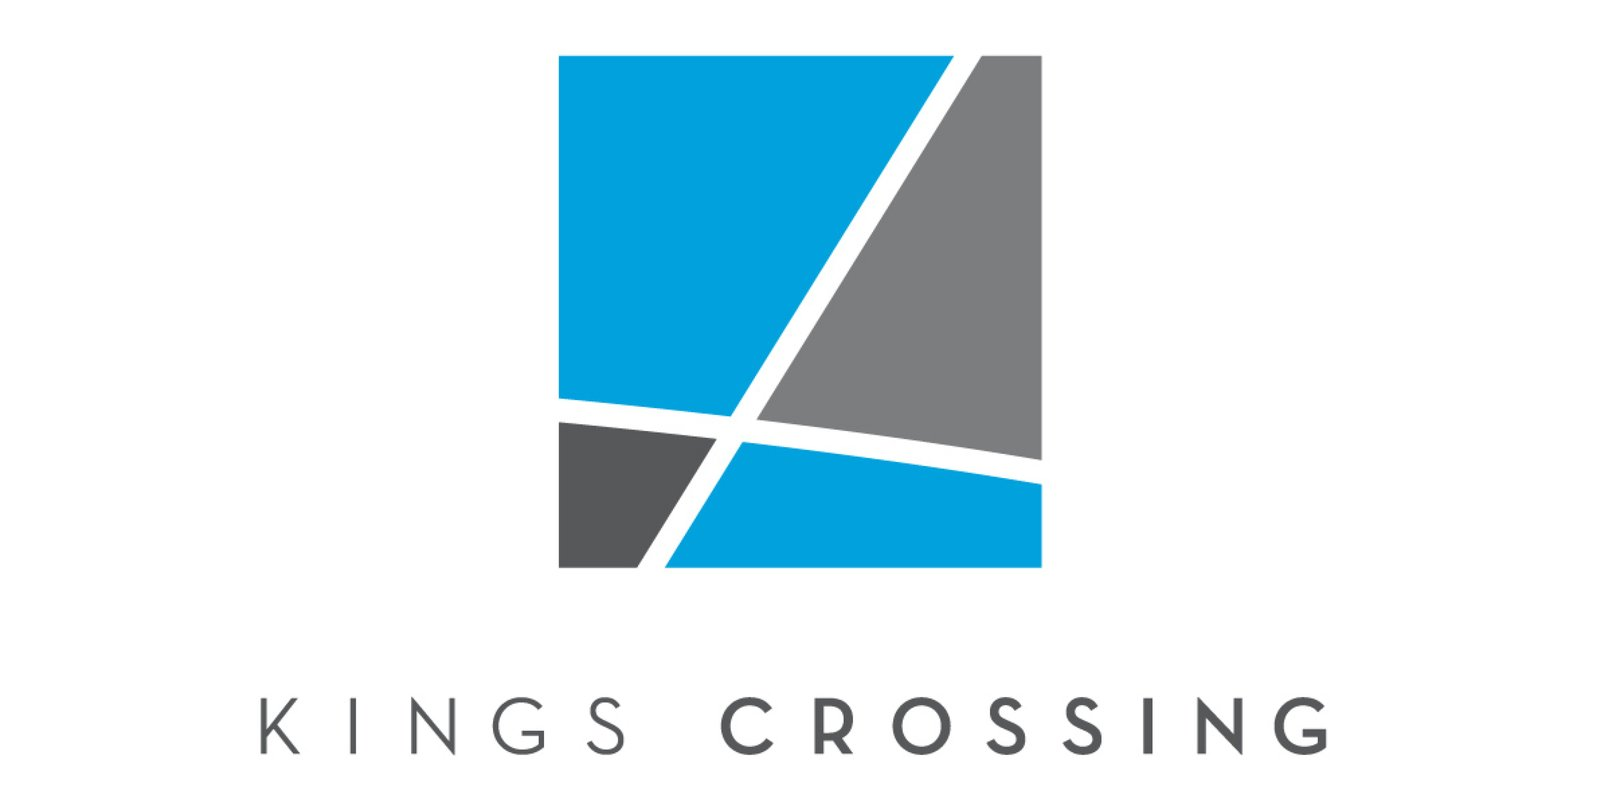 KINGS CROSSING BY CRESSEY